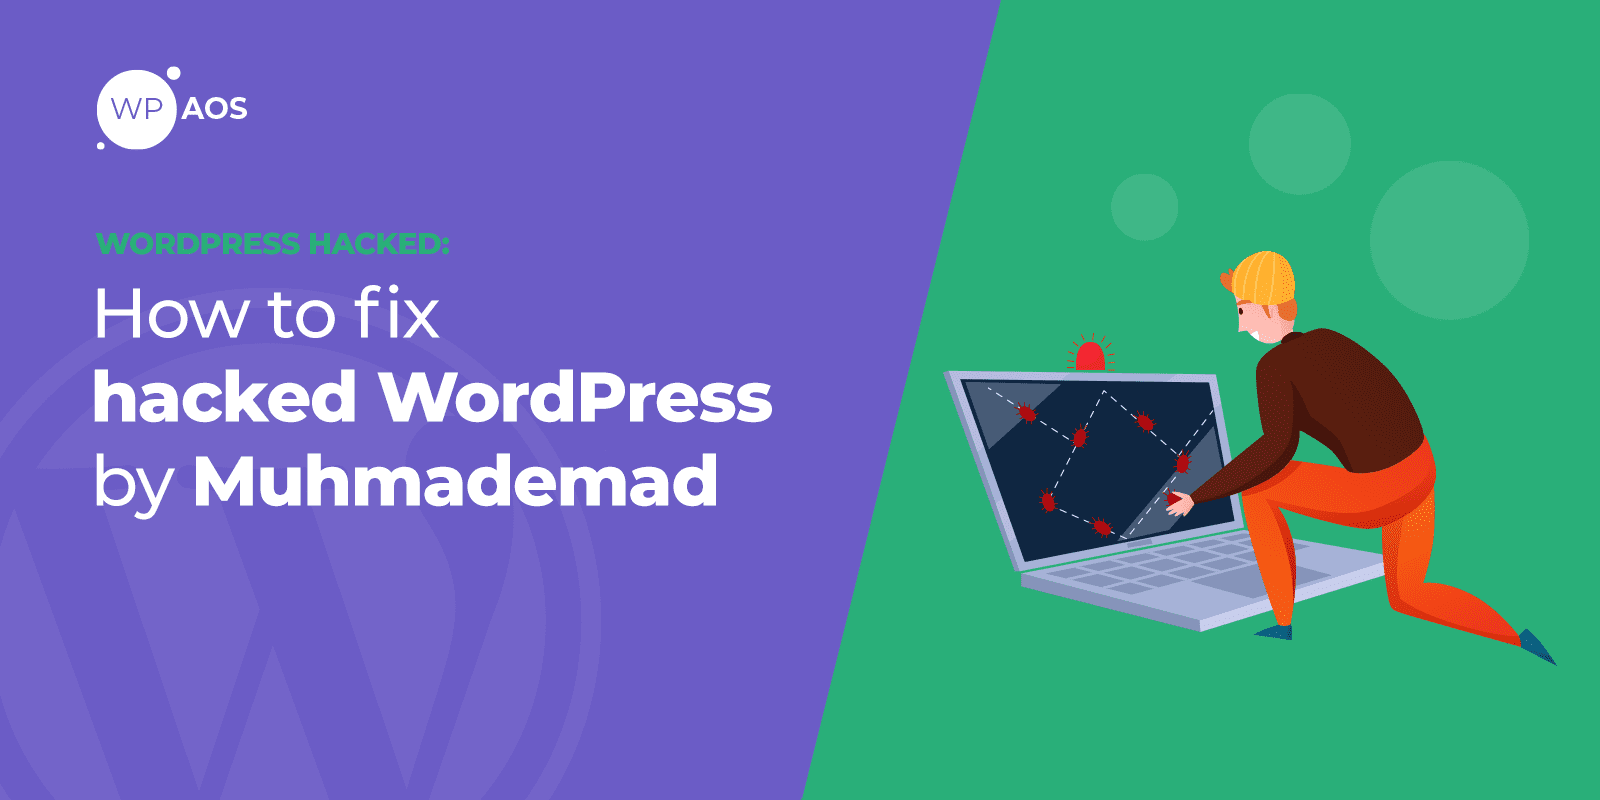 Hacked by MuhmadEmad, WordPress Errors, wpaos